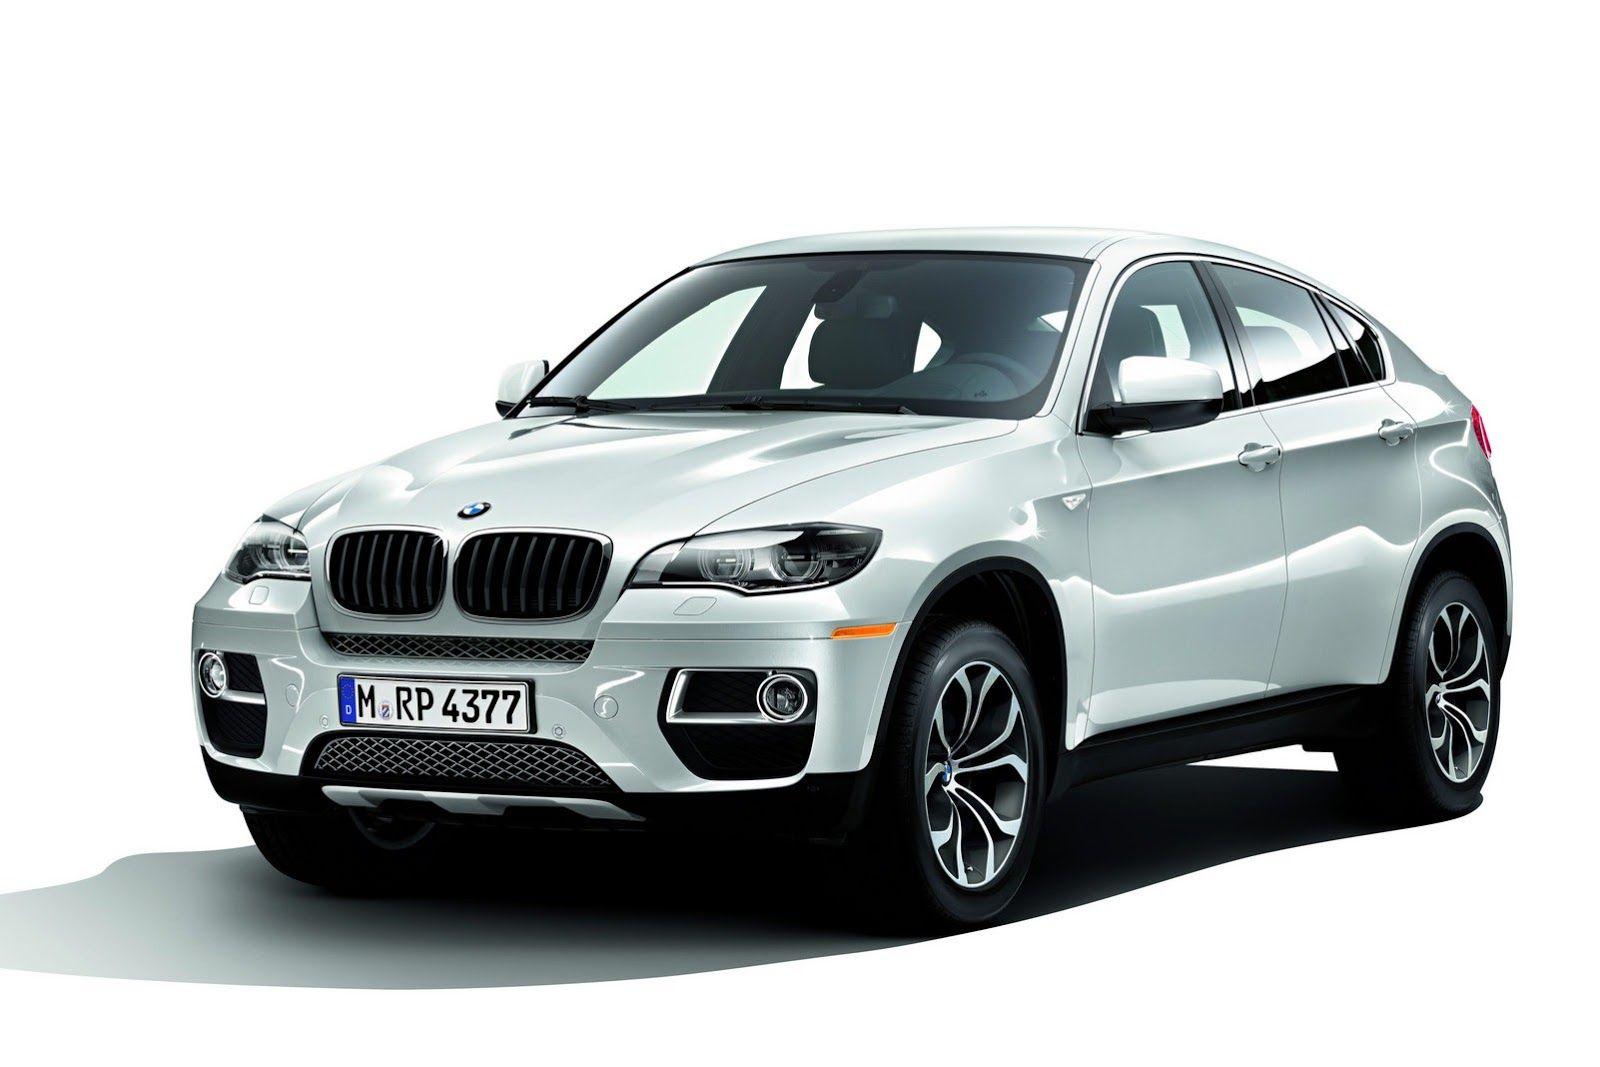 E71-BMW-X6-Frozen-gray.jpg (1600×1067)